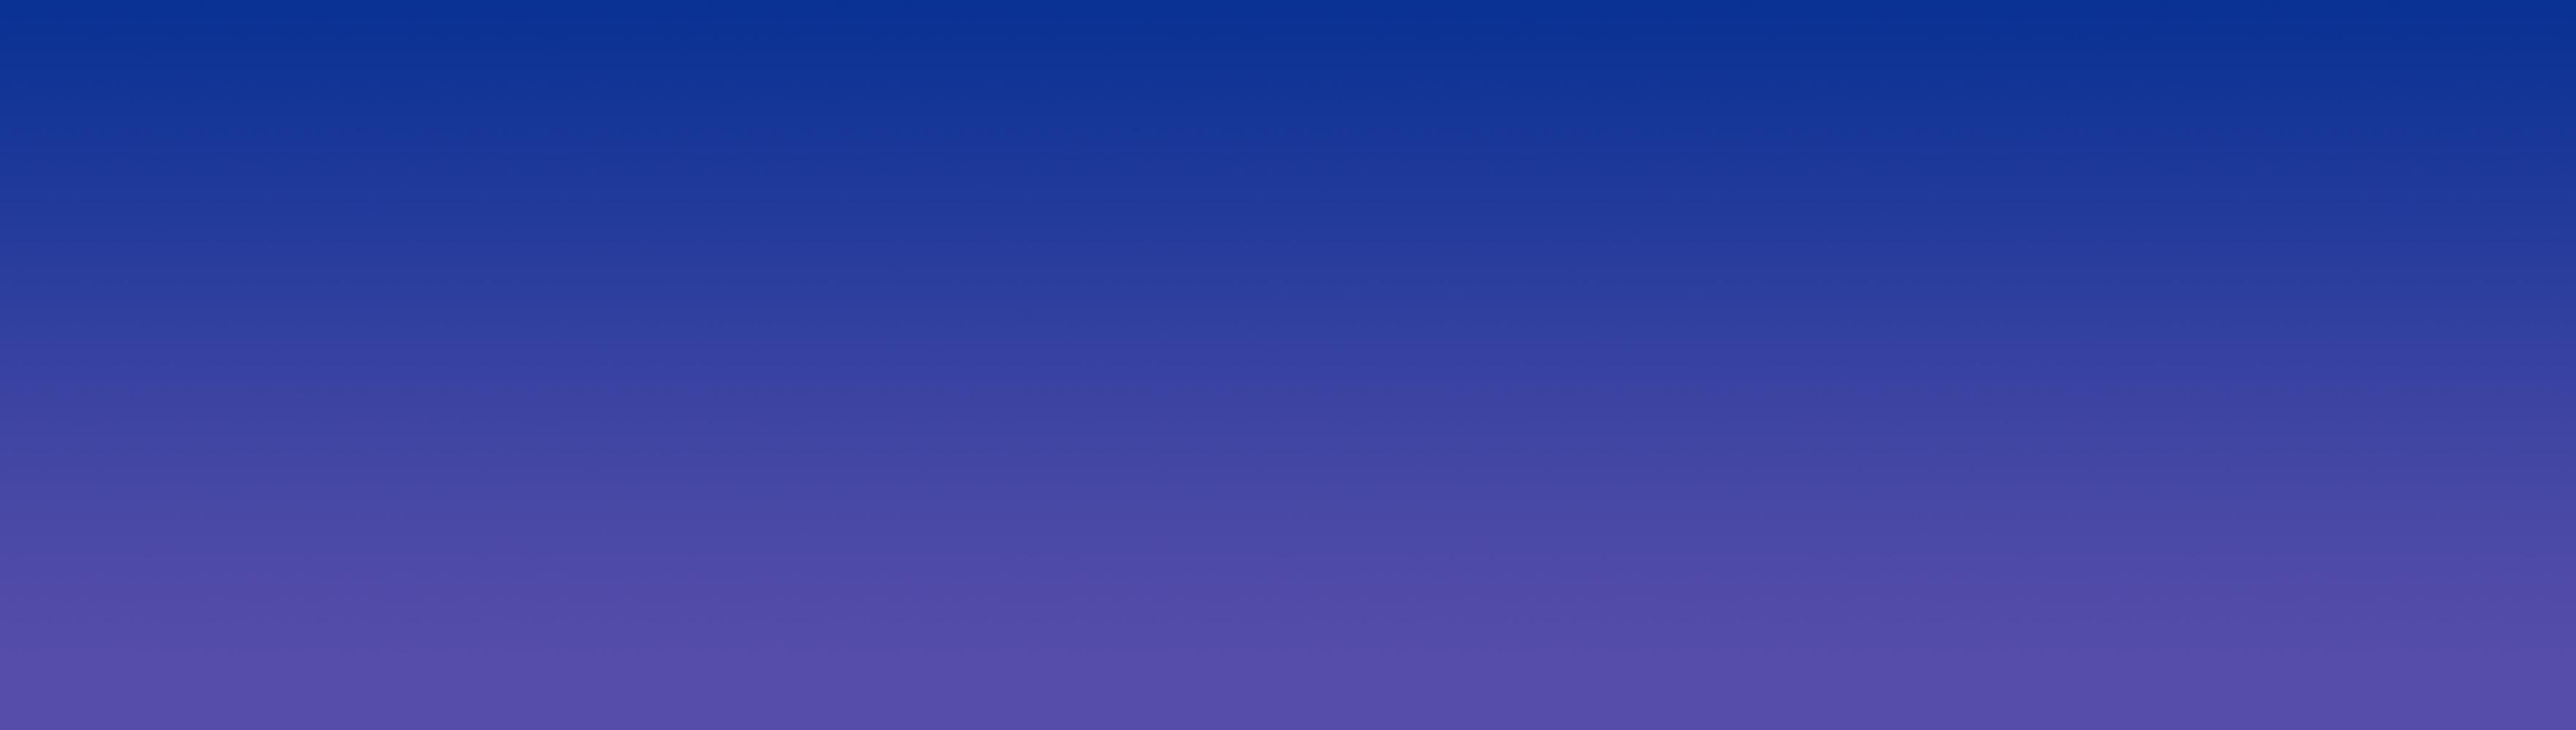 multi-service-promo-background.jpg